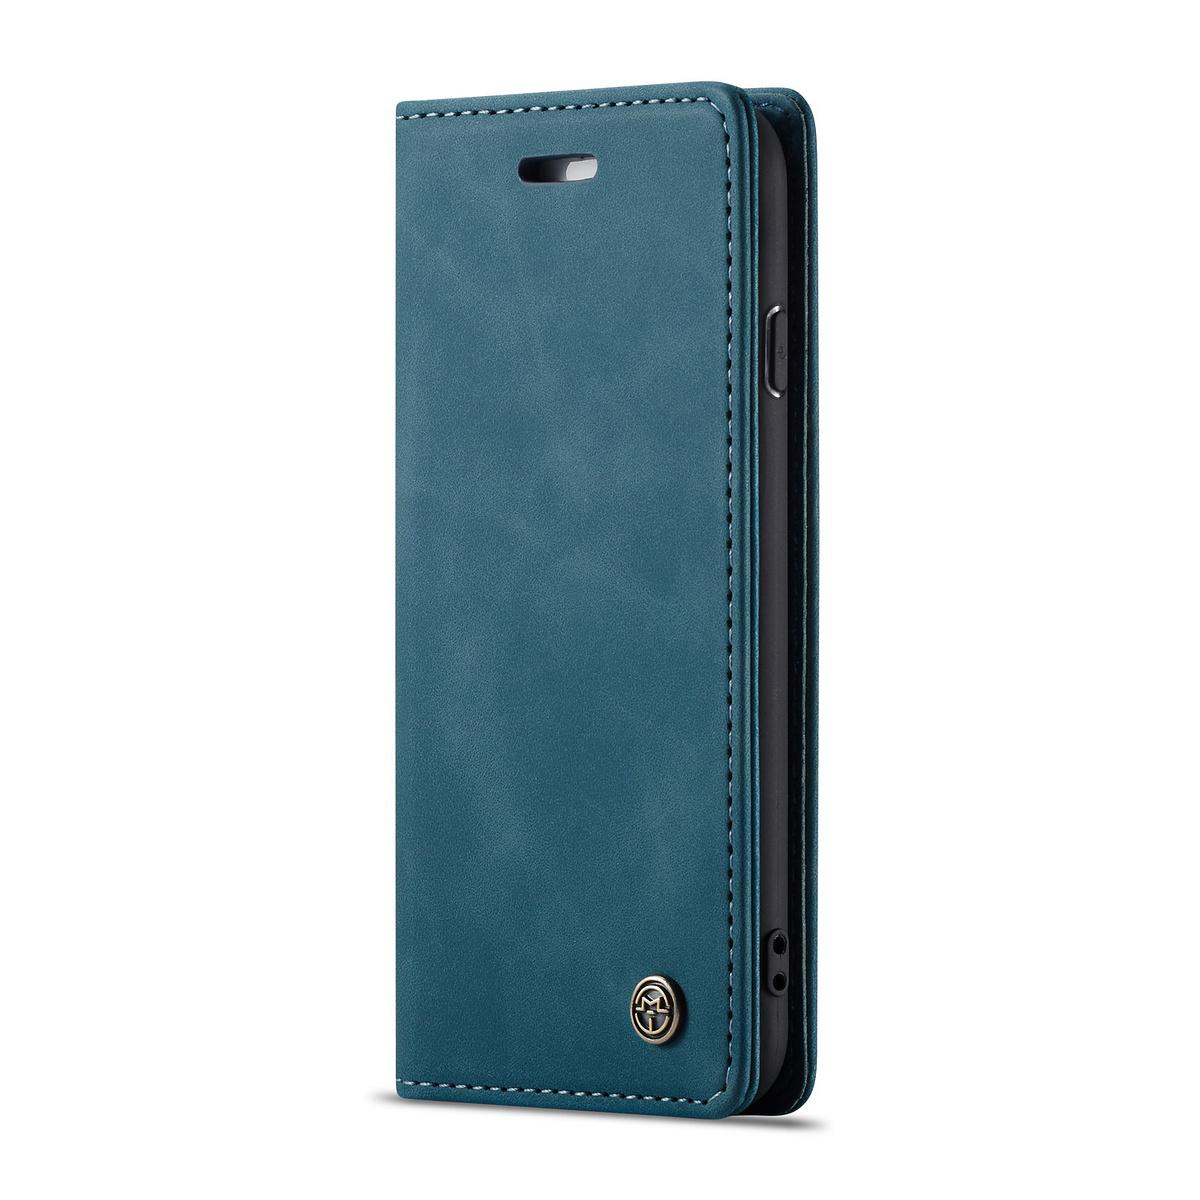 CaseMe plånboksfodral till iPhone 8/7, blå